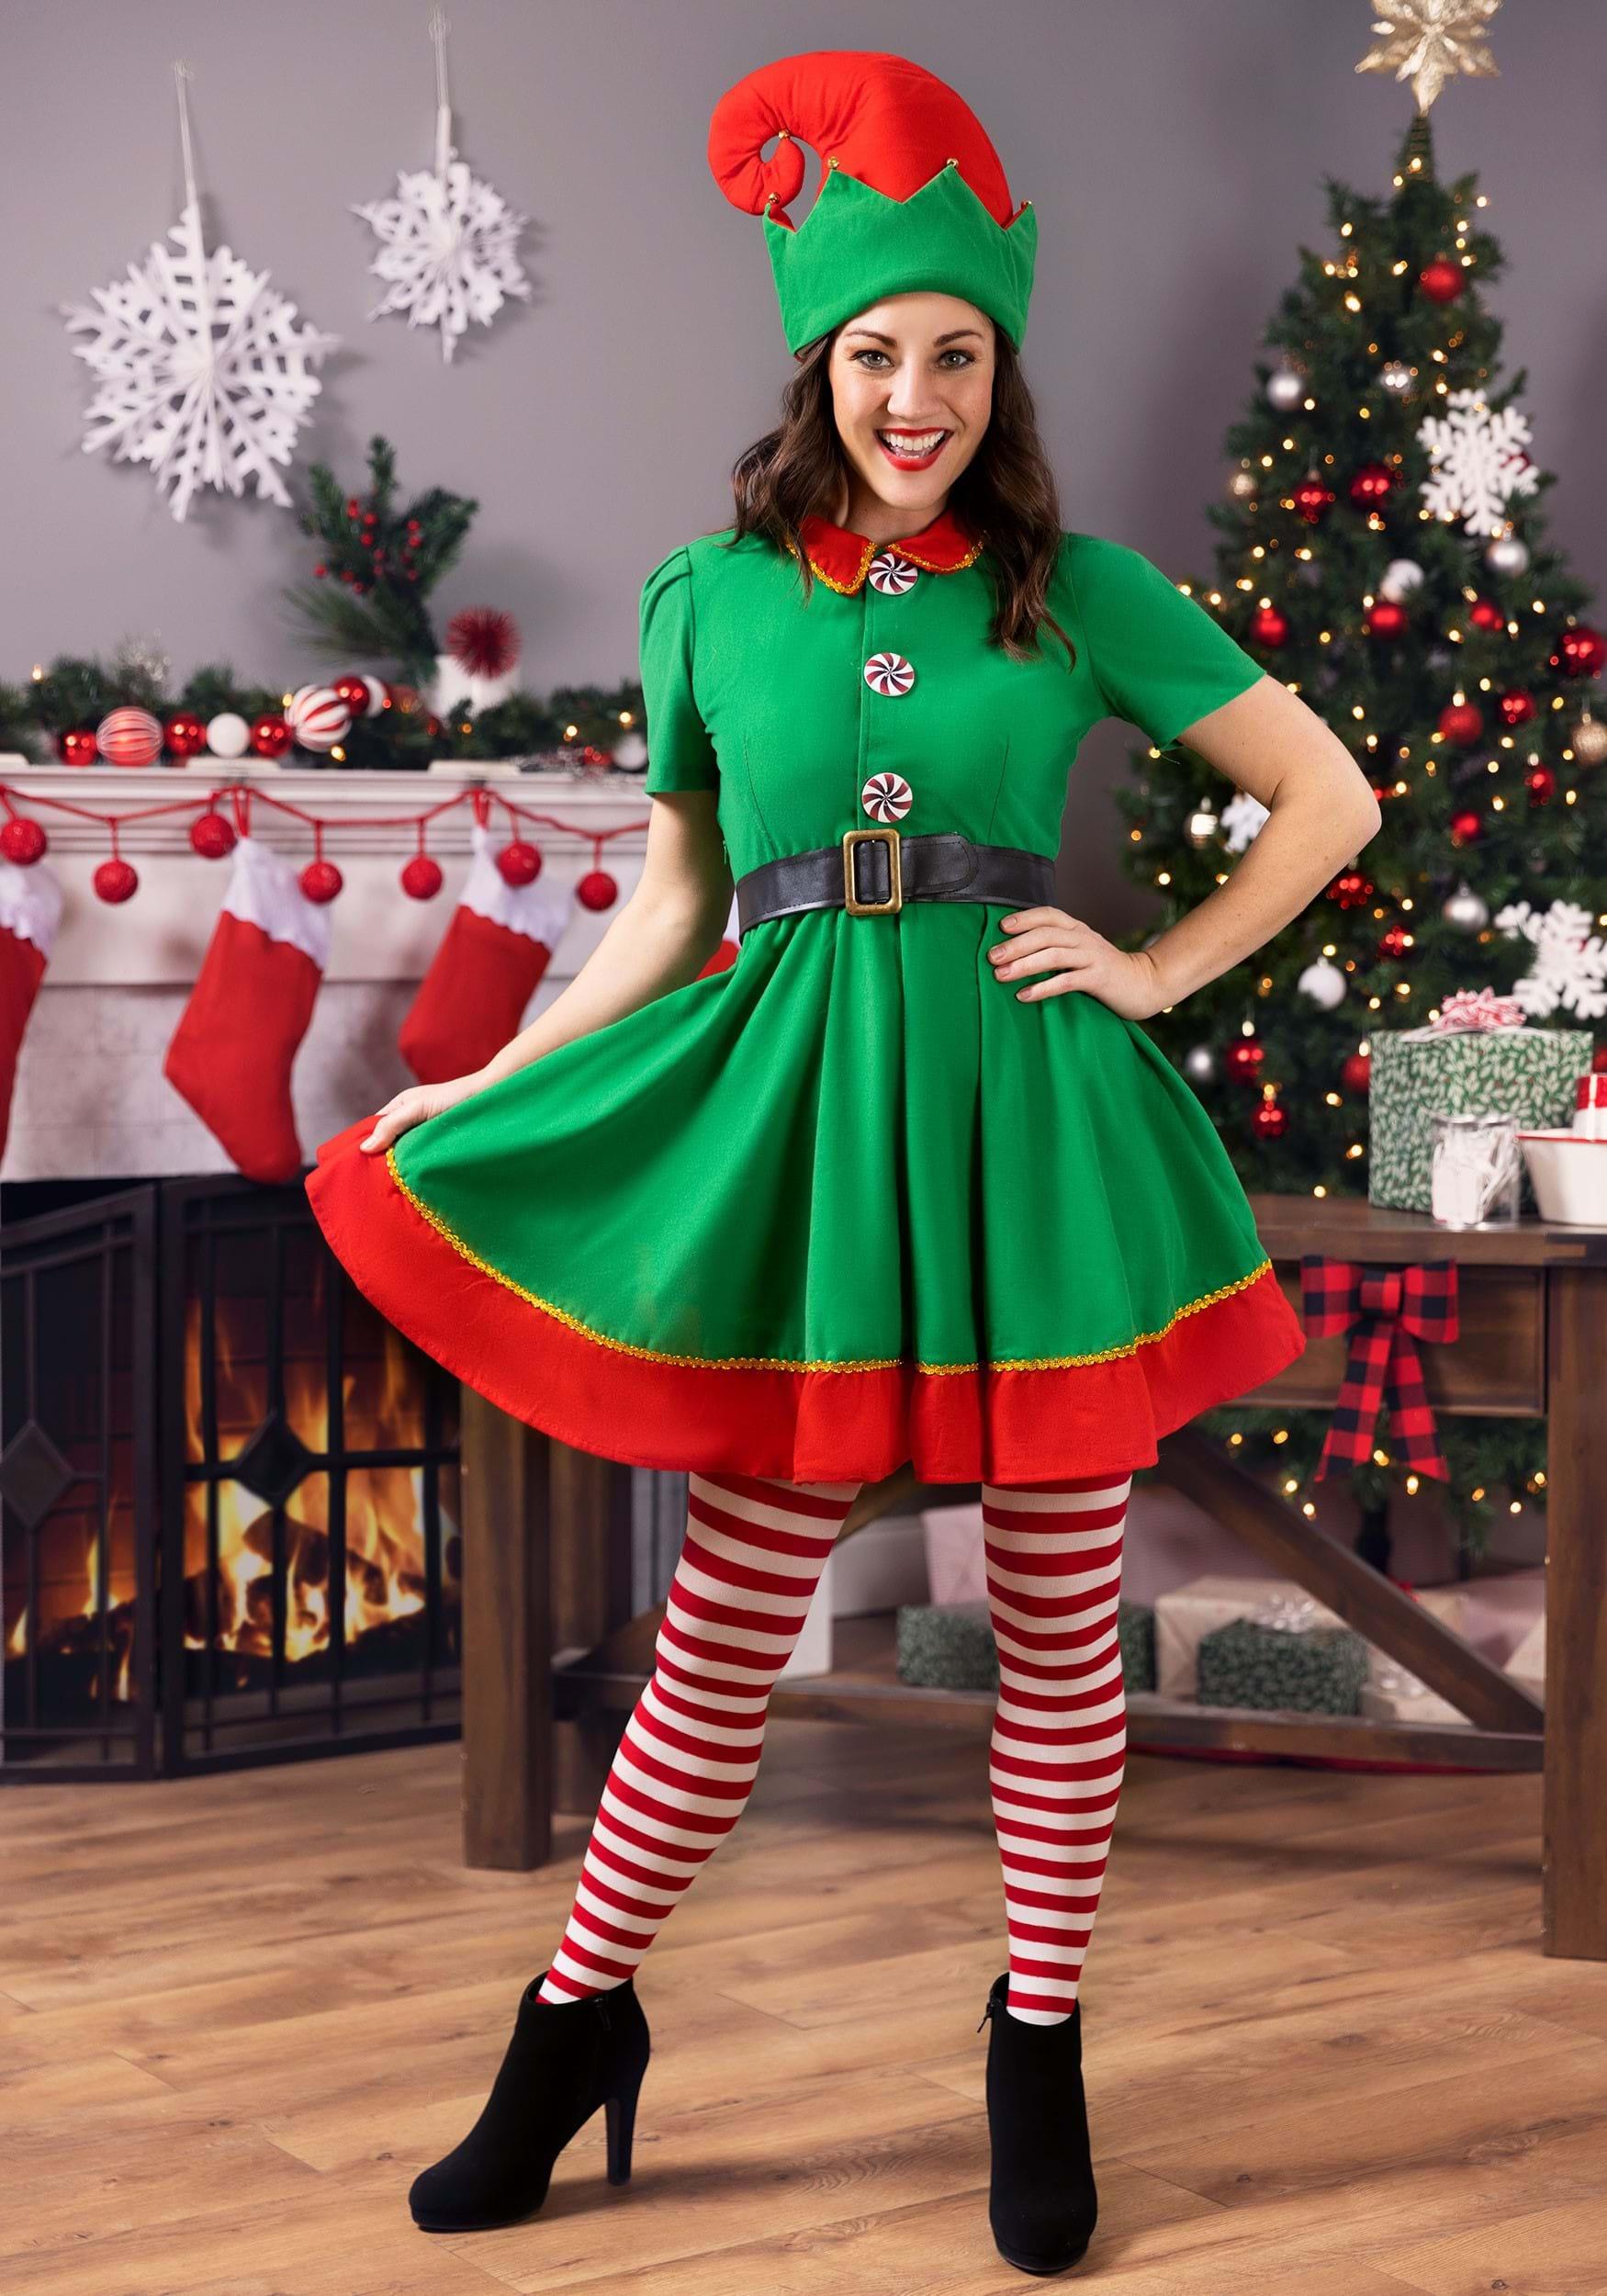 ed3fdce896cde Women s Holiday Elf Costume